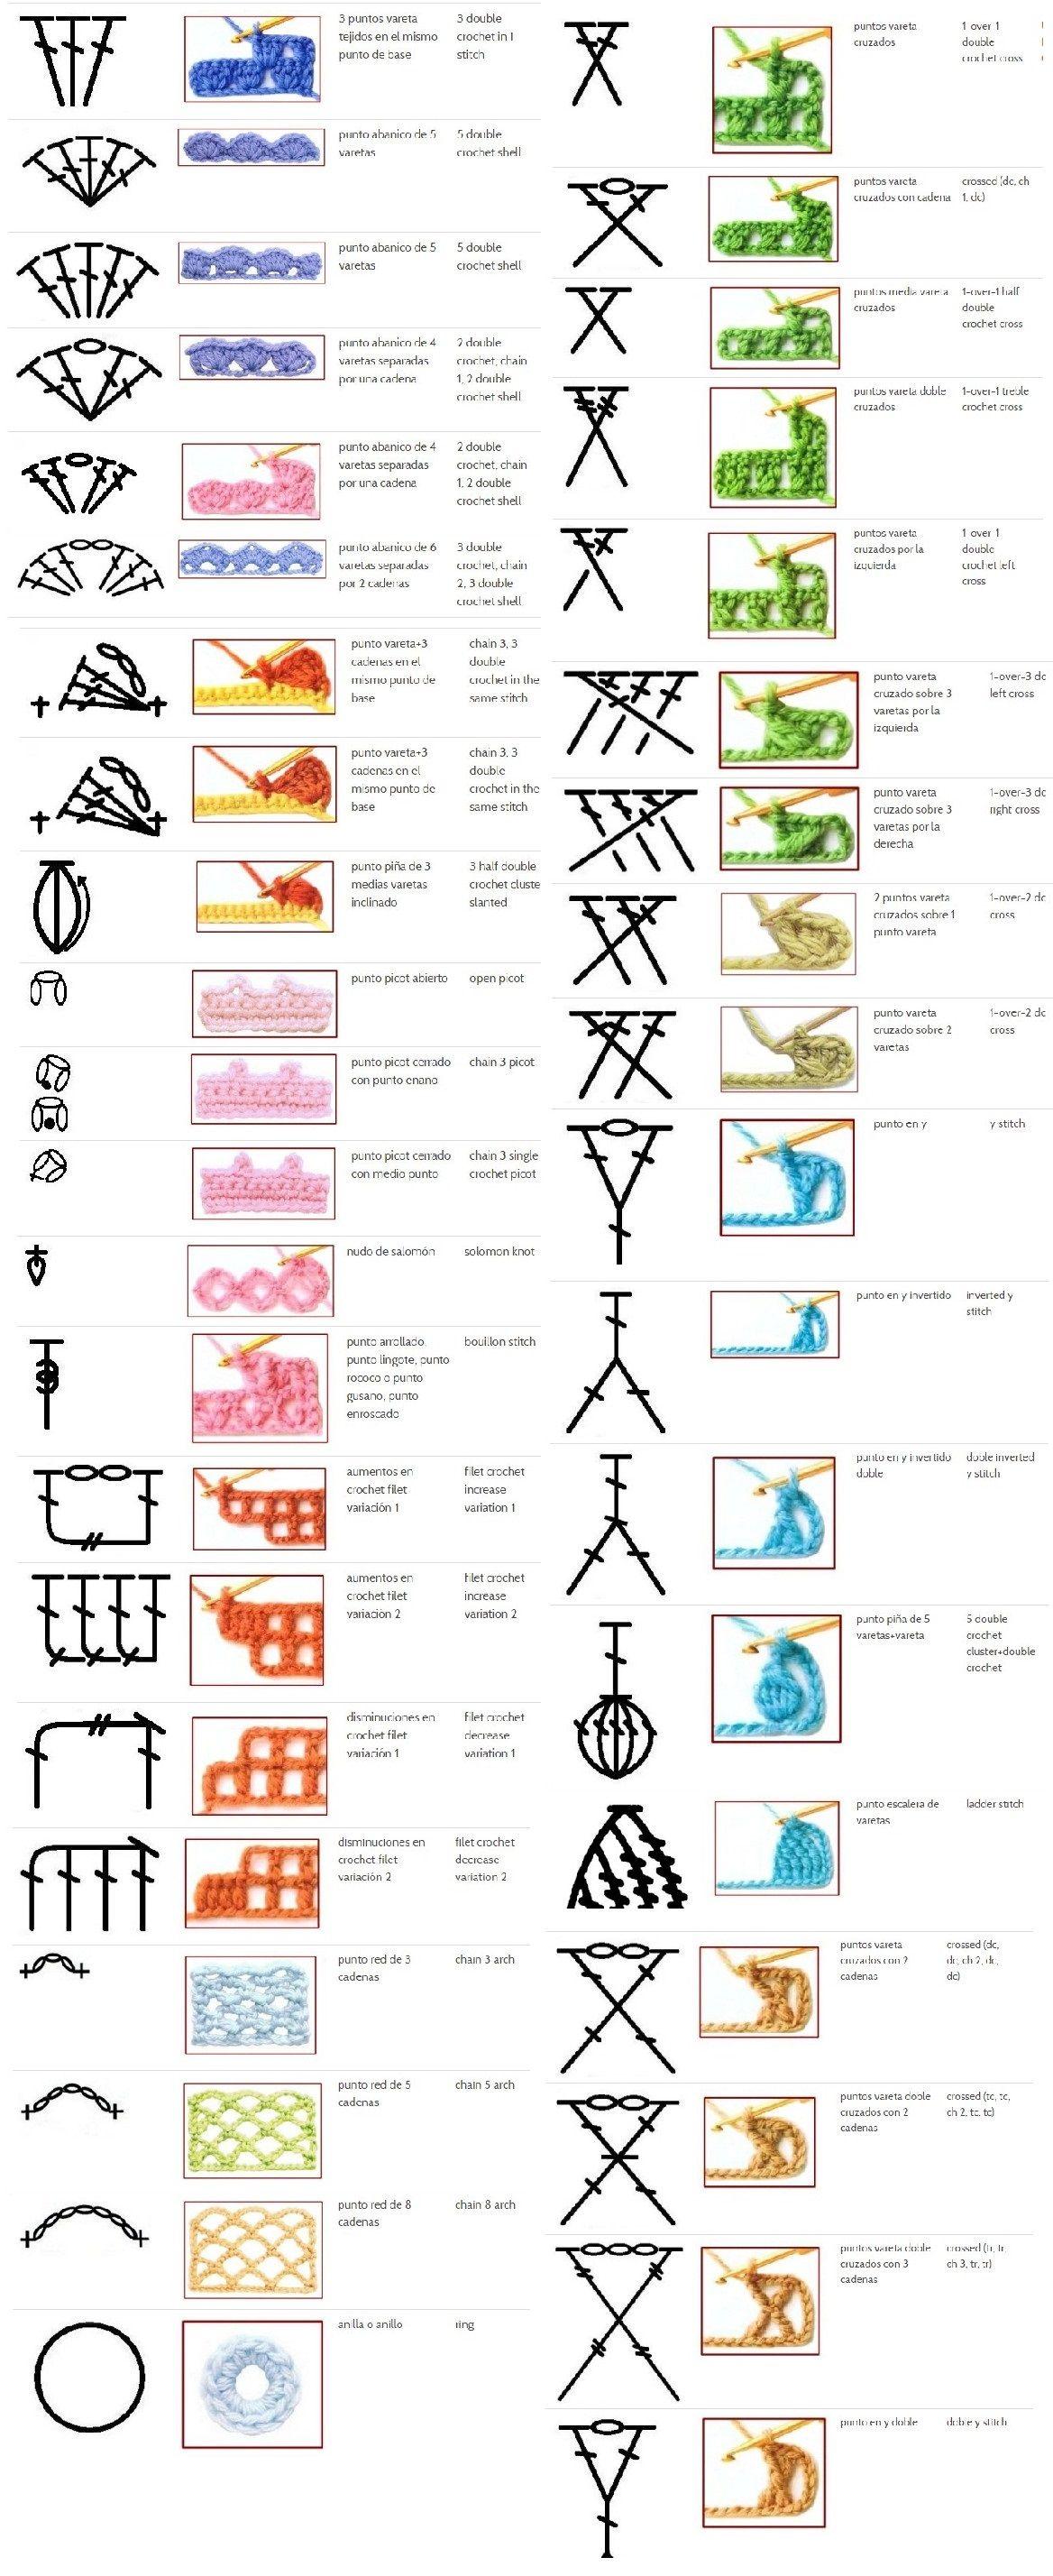 Basic Crochet Stitches Part 2 | For the Needles | Pinterest